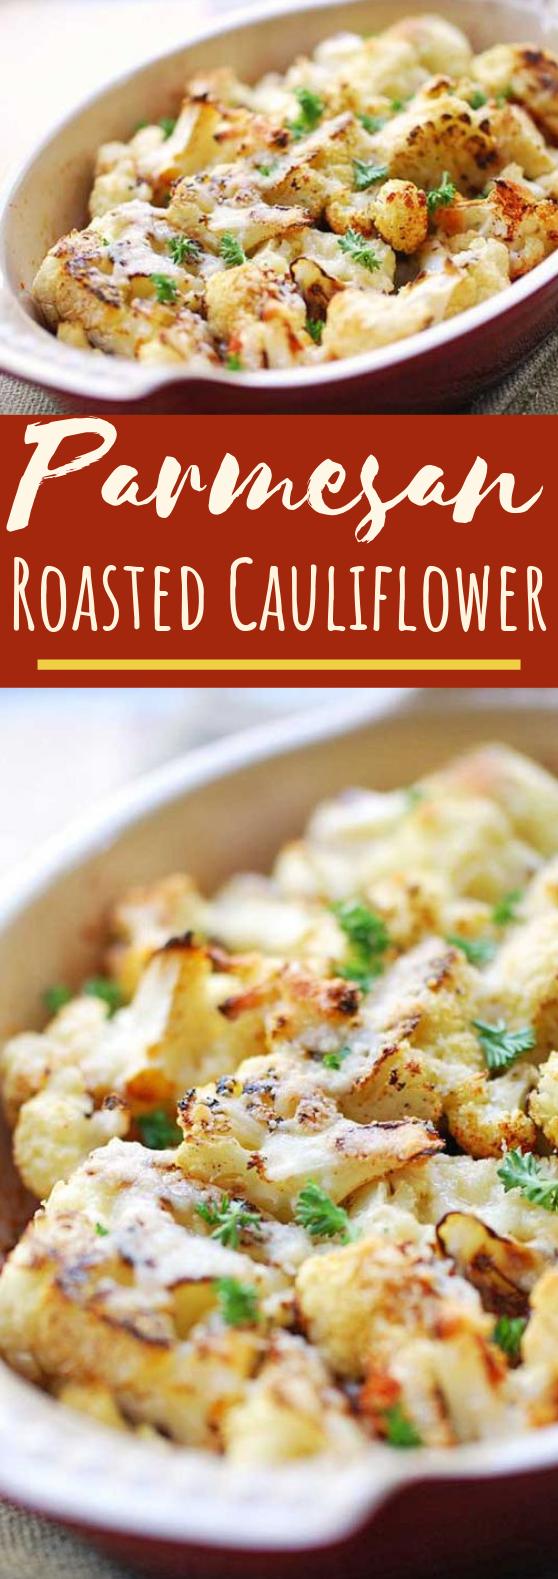 Parmesan Roasted Cauliflower #vegetarian #vegetables